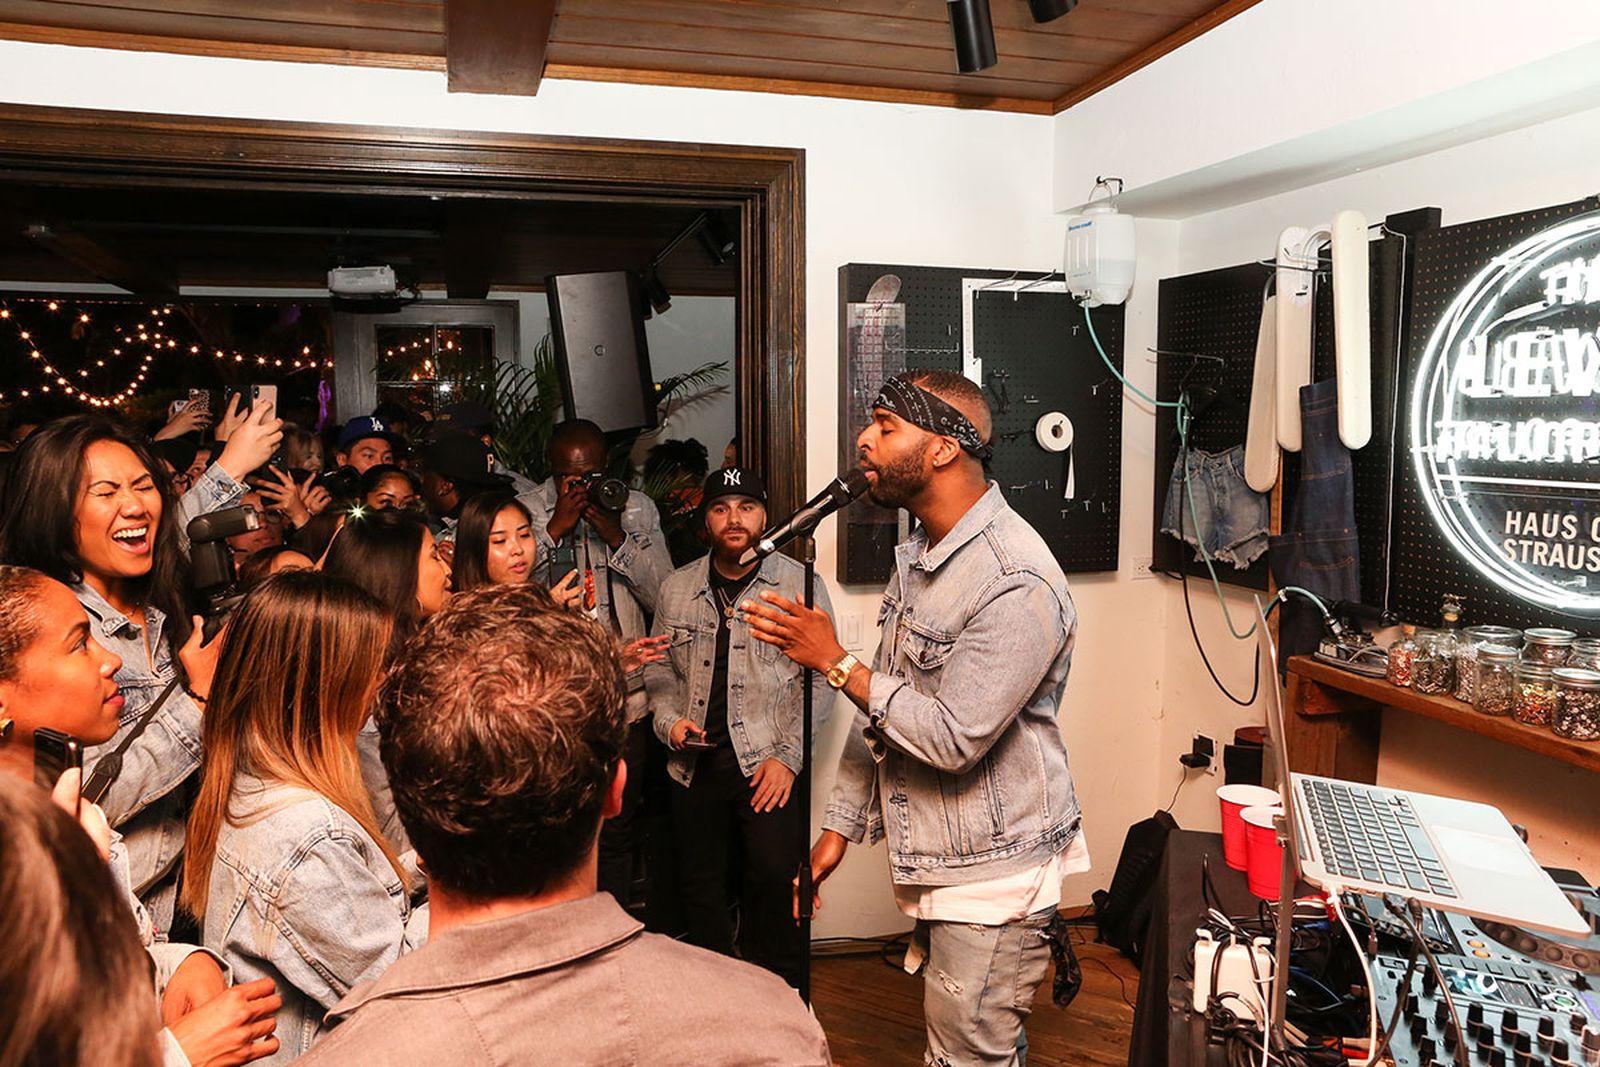 dvsn night shift coachella recap Coachella 2019 Levi's